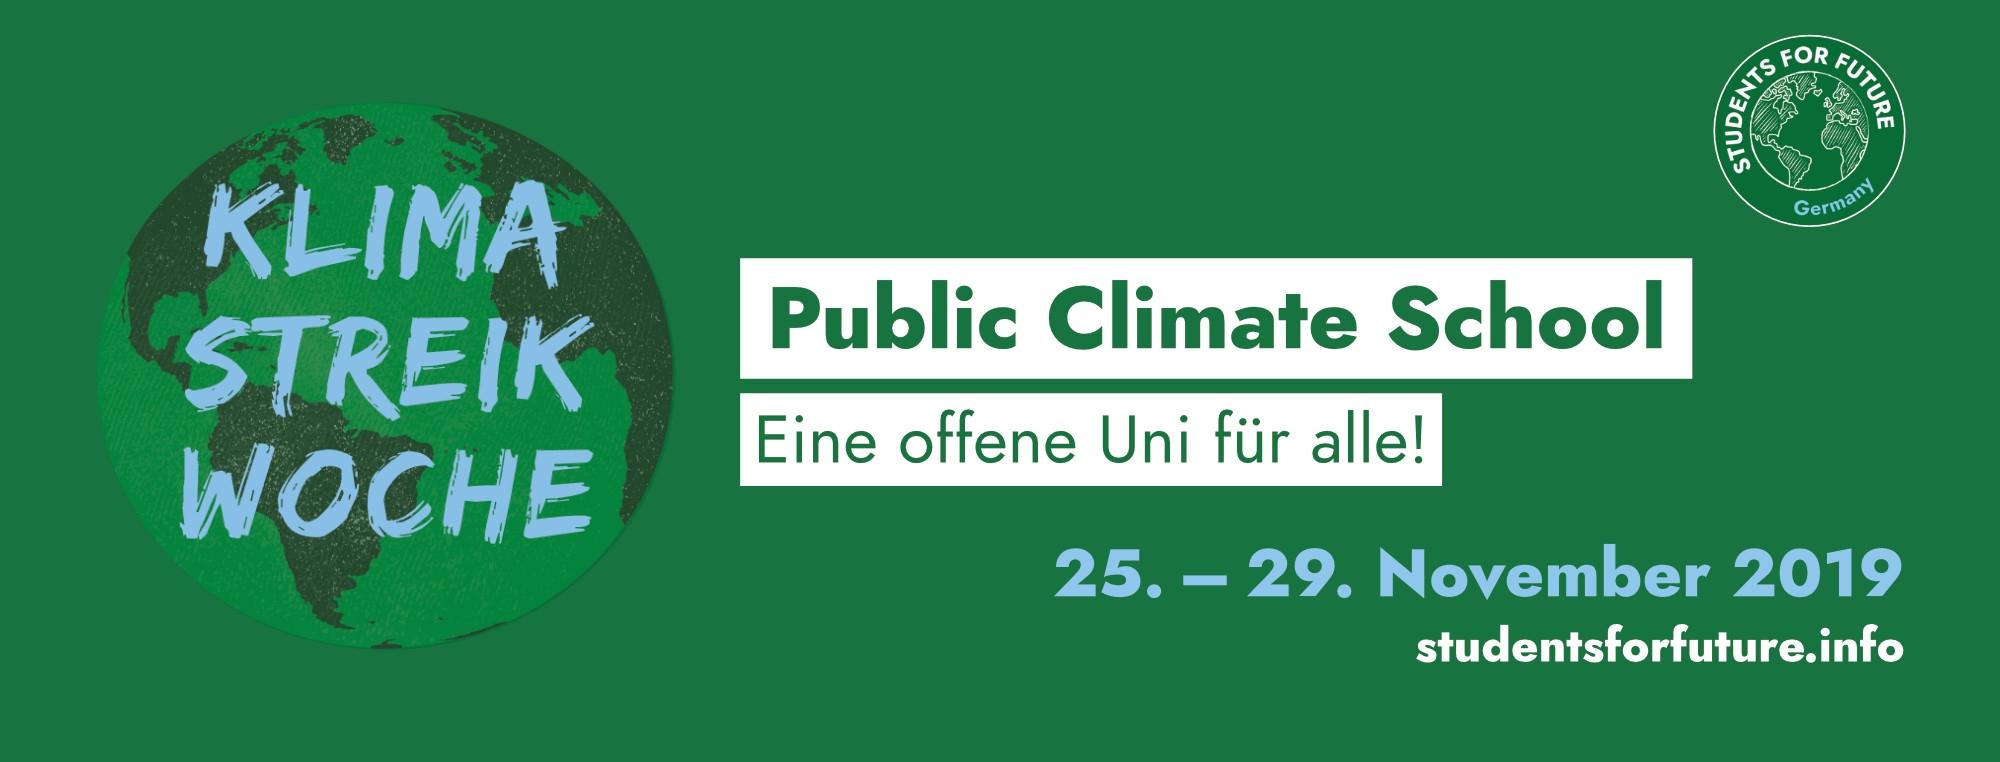 Logo public climate school